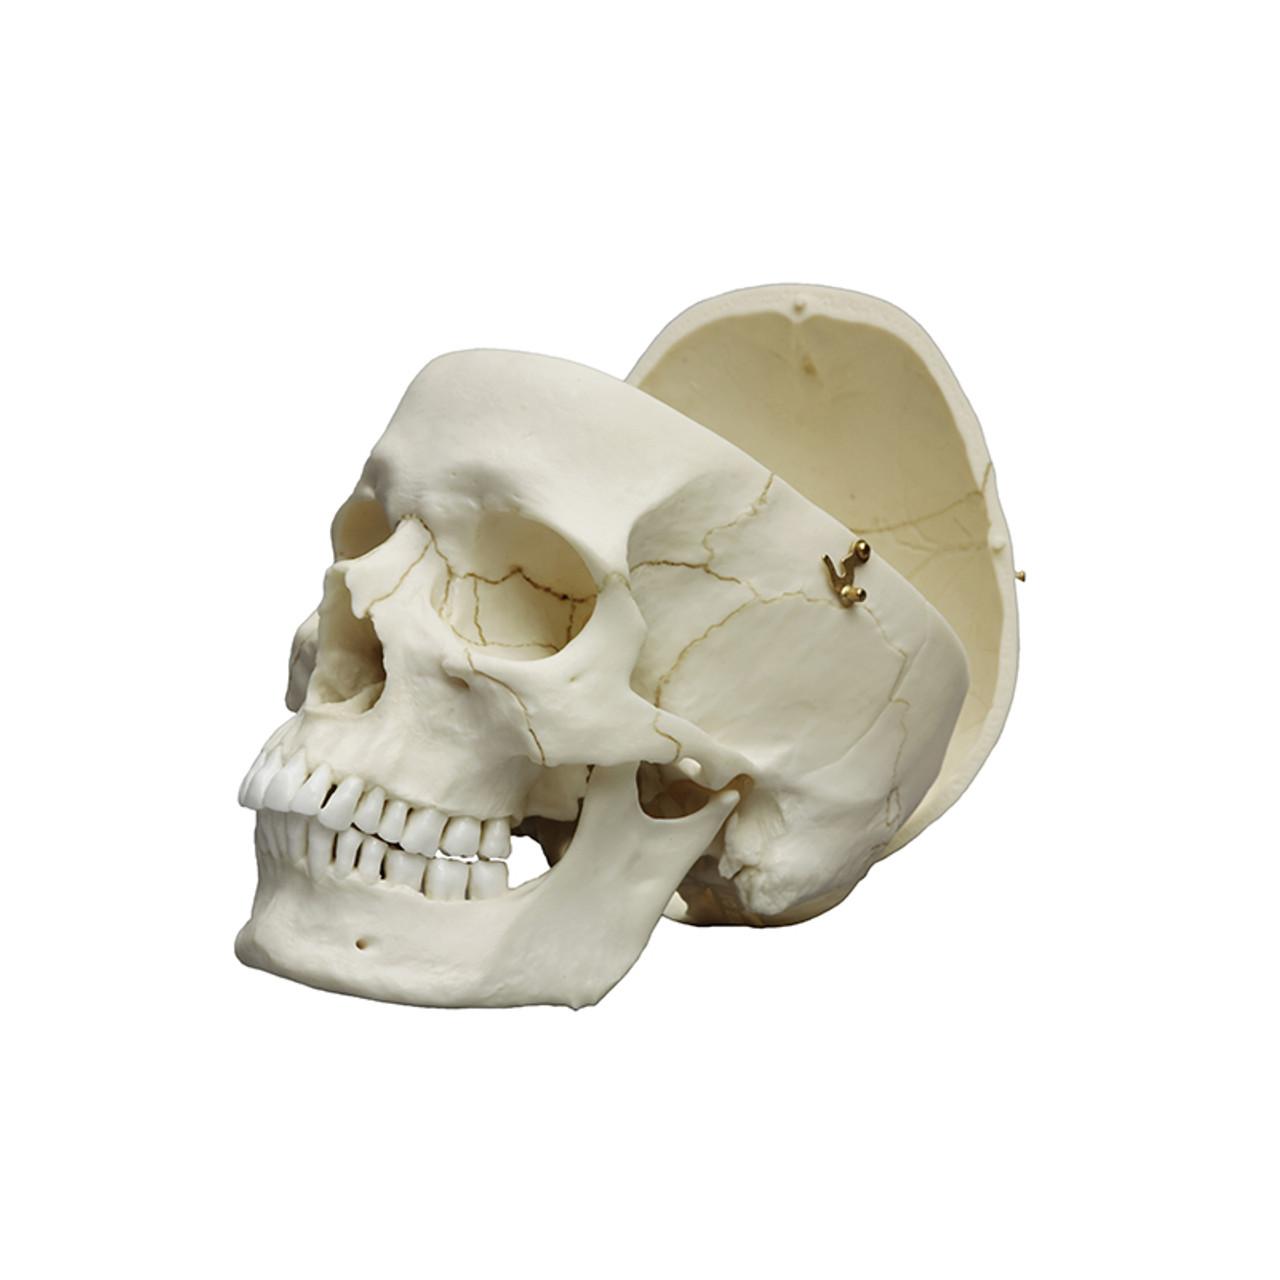 Human male European skull, calvarium cut